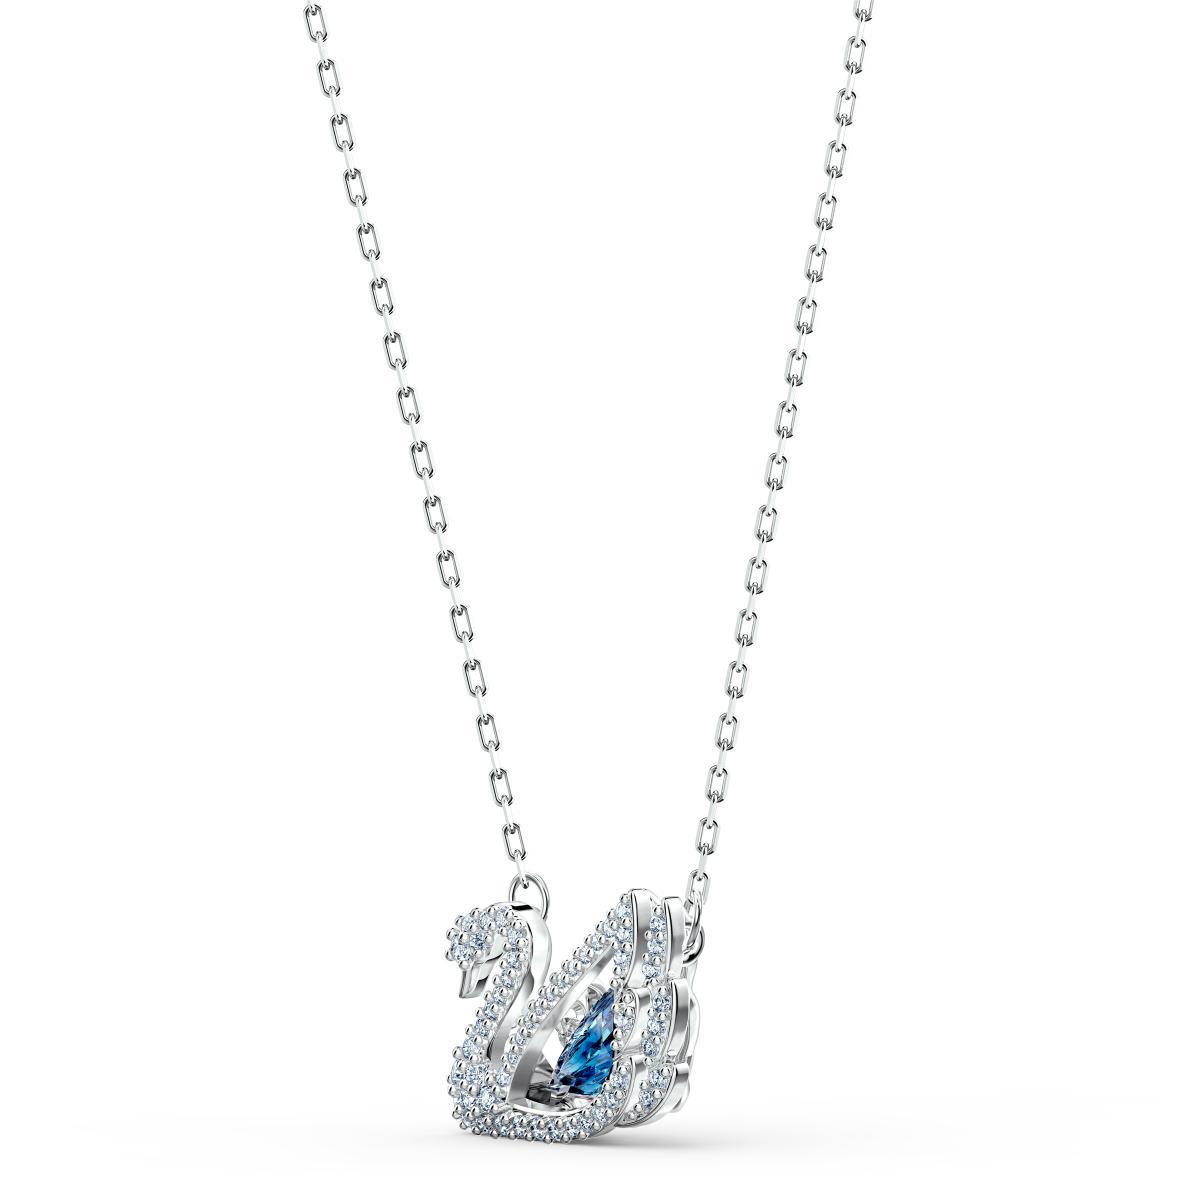 COLLIER Swarovski 5533397 - Collier Métal Argenté Cygne Strass et Cristal  Bleu Femme